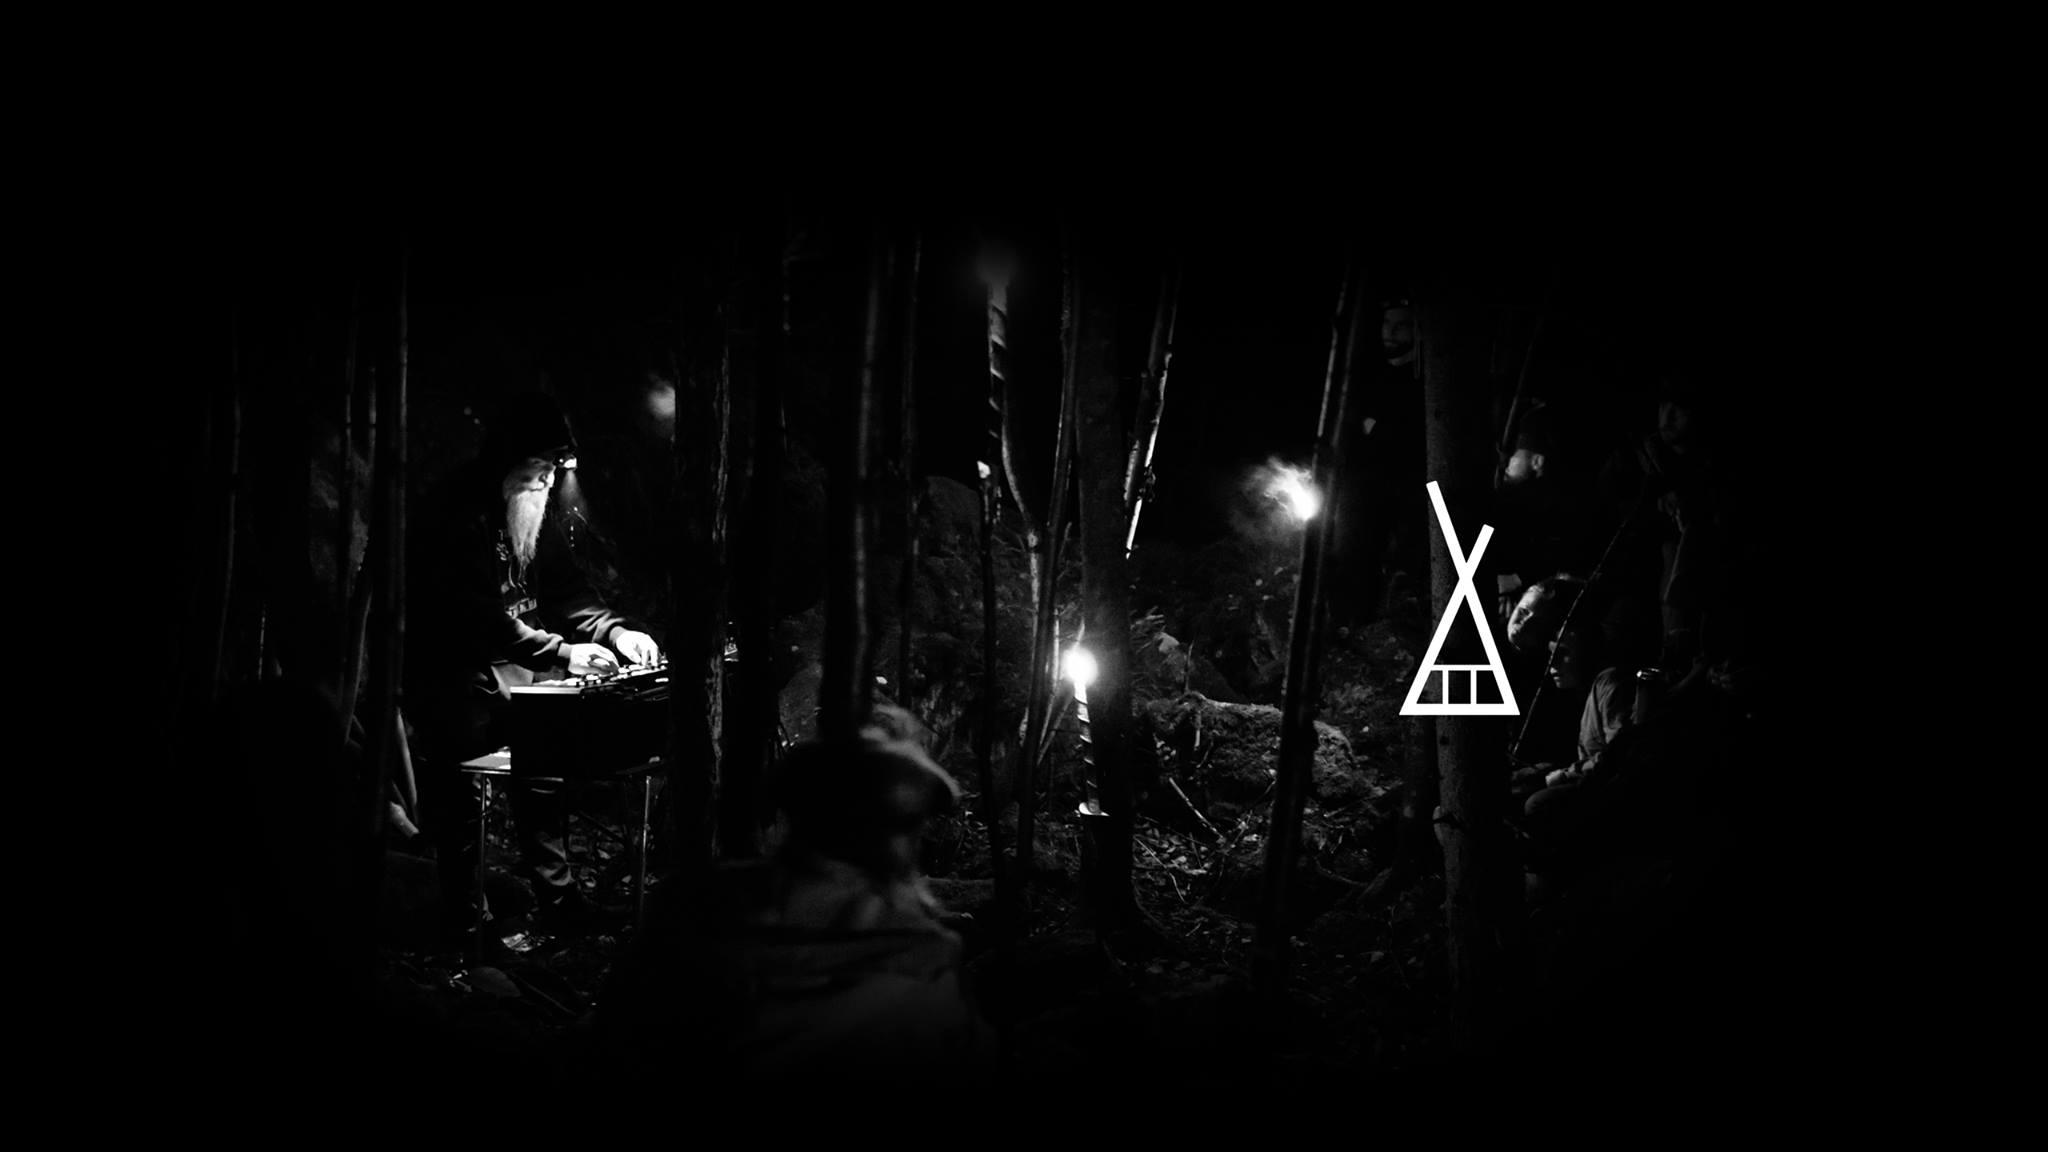 b86305964 Sysselmann - Live at Mir - Review, Exclusive Full Album Stream ...